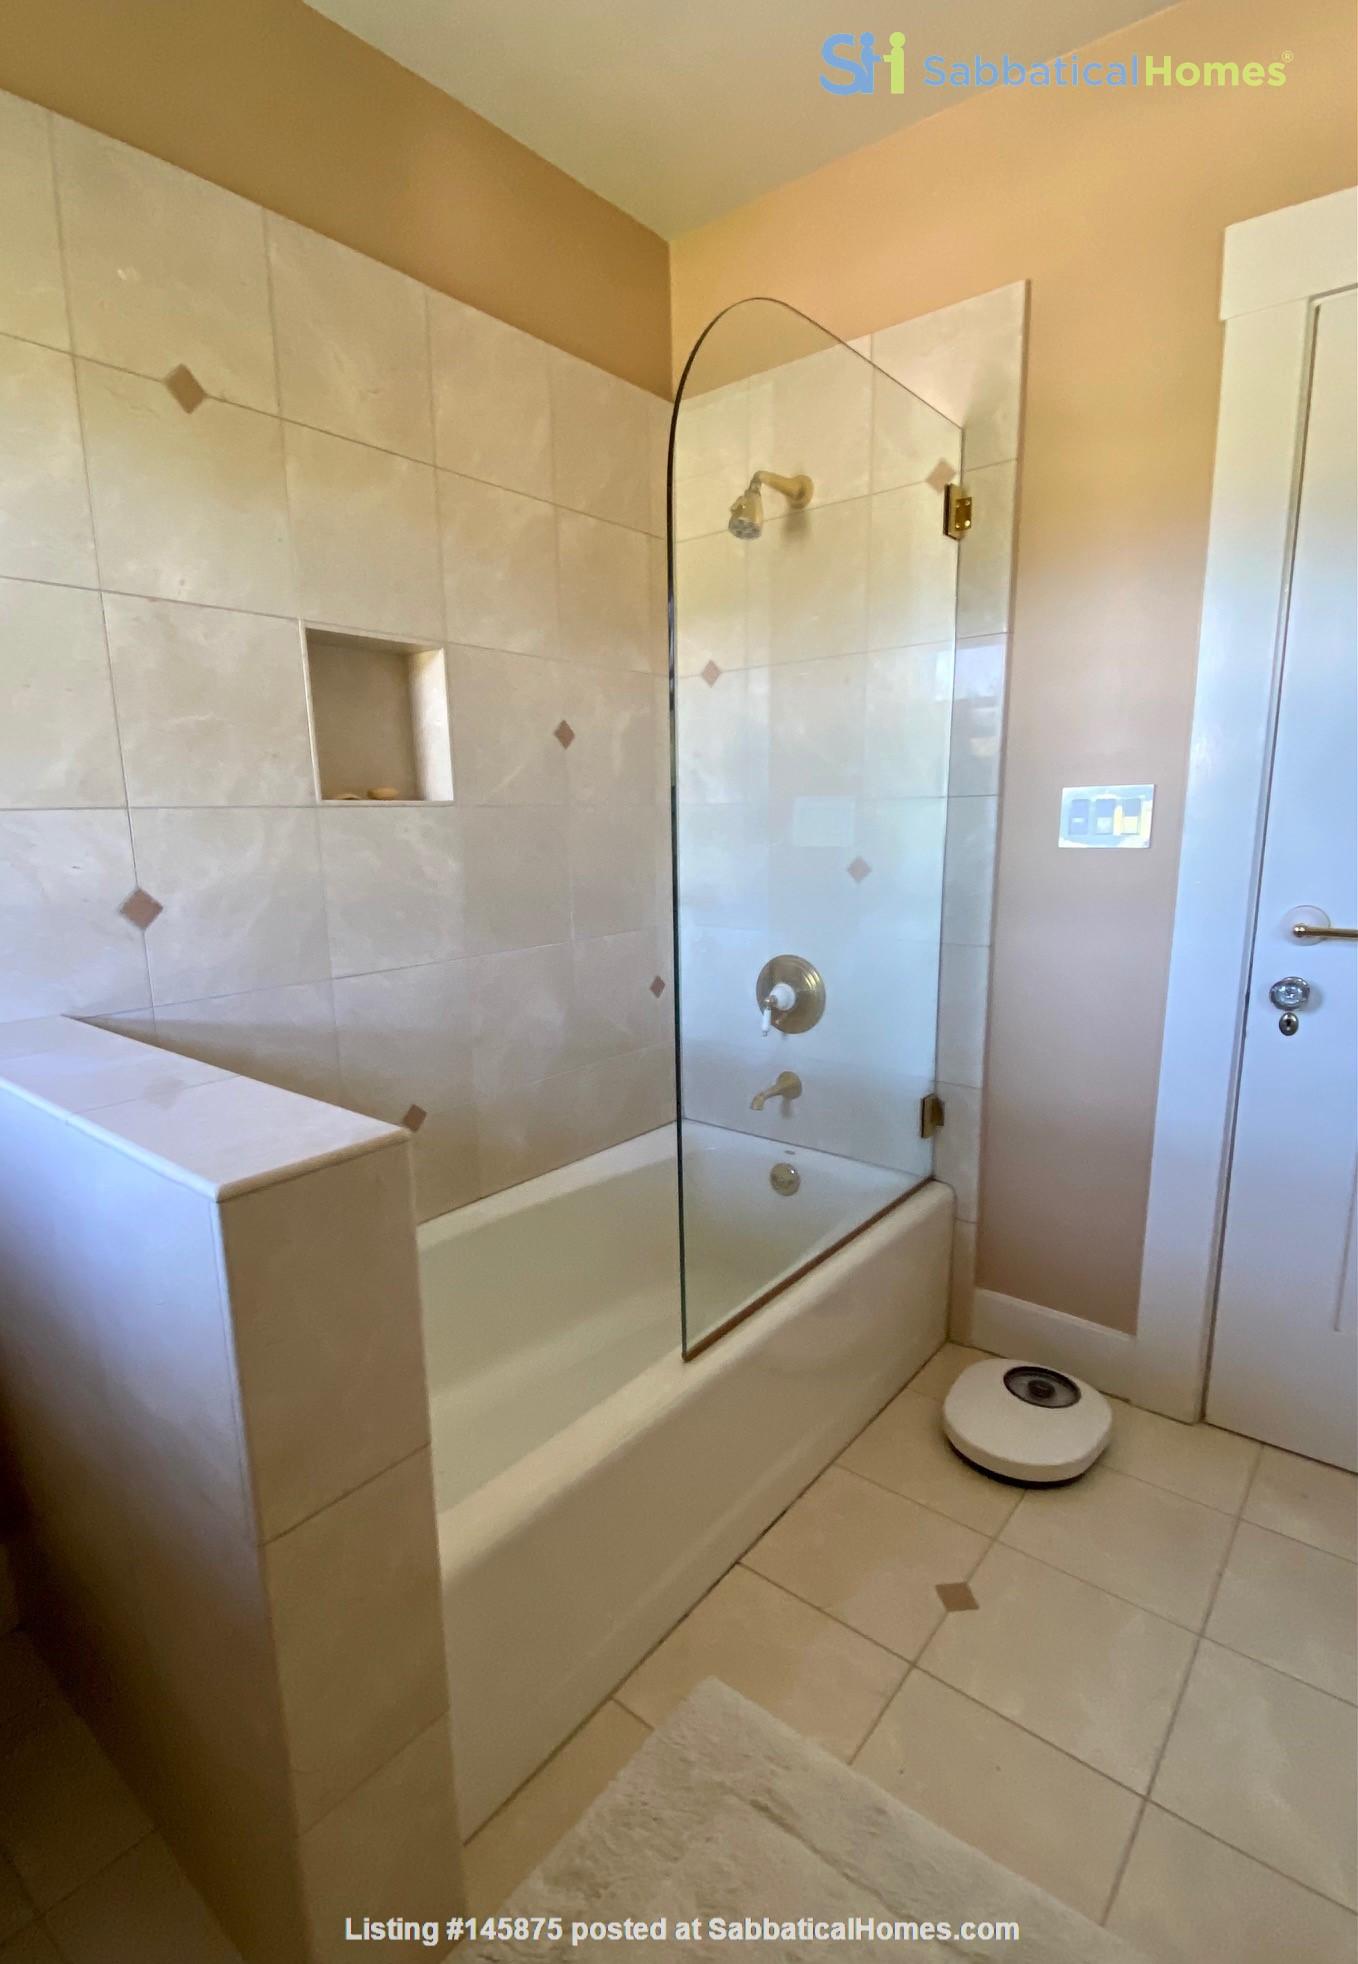 Beautiful 4 Bedroom Craftsman Home in Highly Rated Piedmont School District Home Rental in Piedmont 5